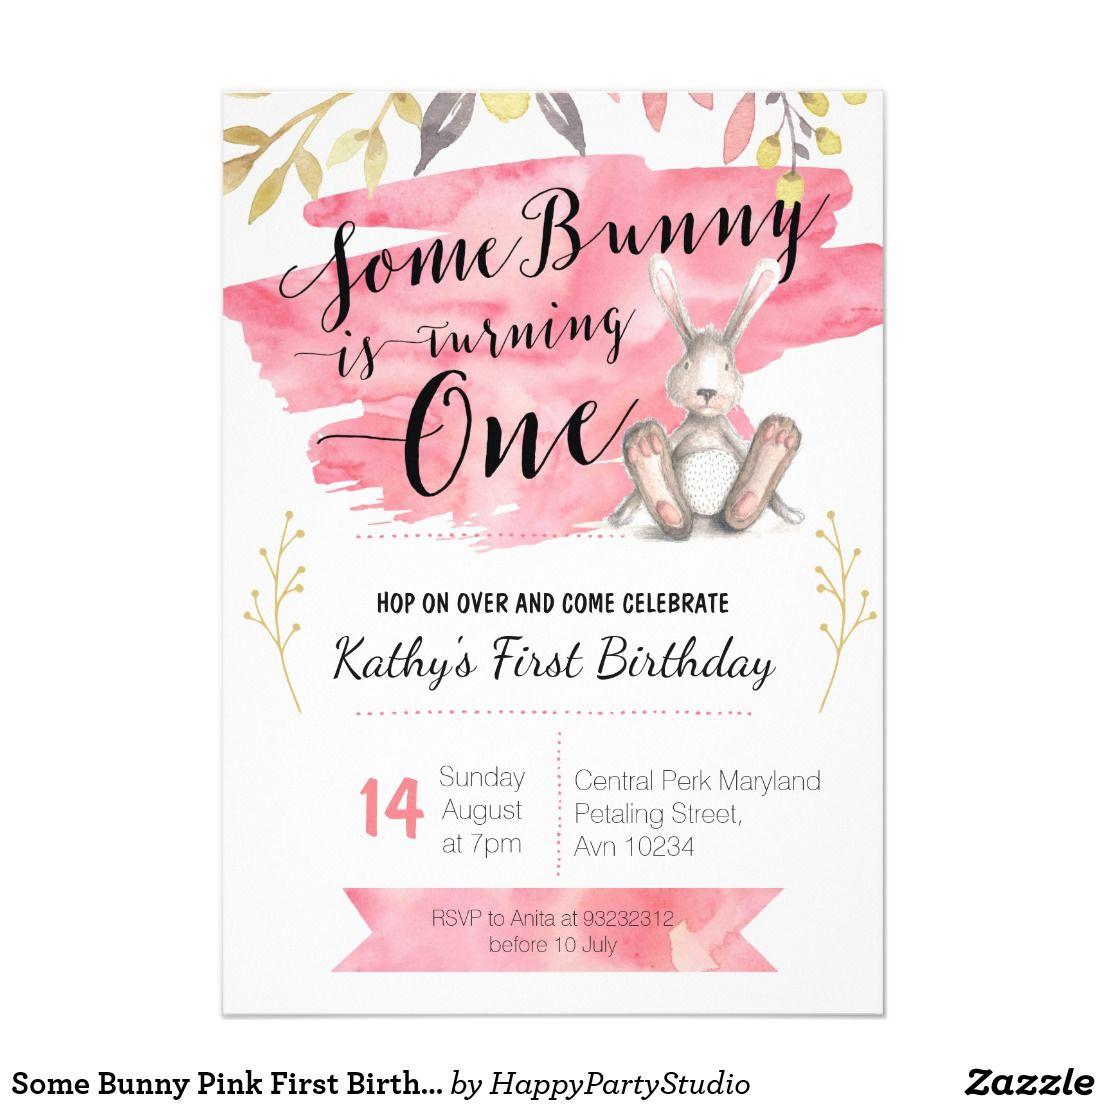 Some Bunny Pink First Birthday Invitation | Pinterest | Birthdays ...